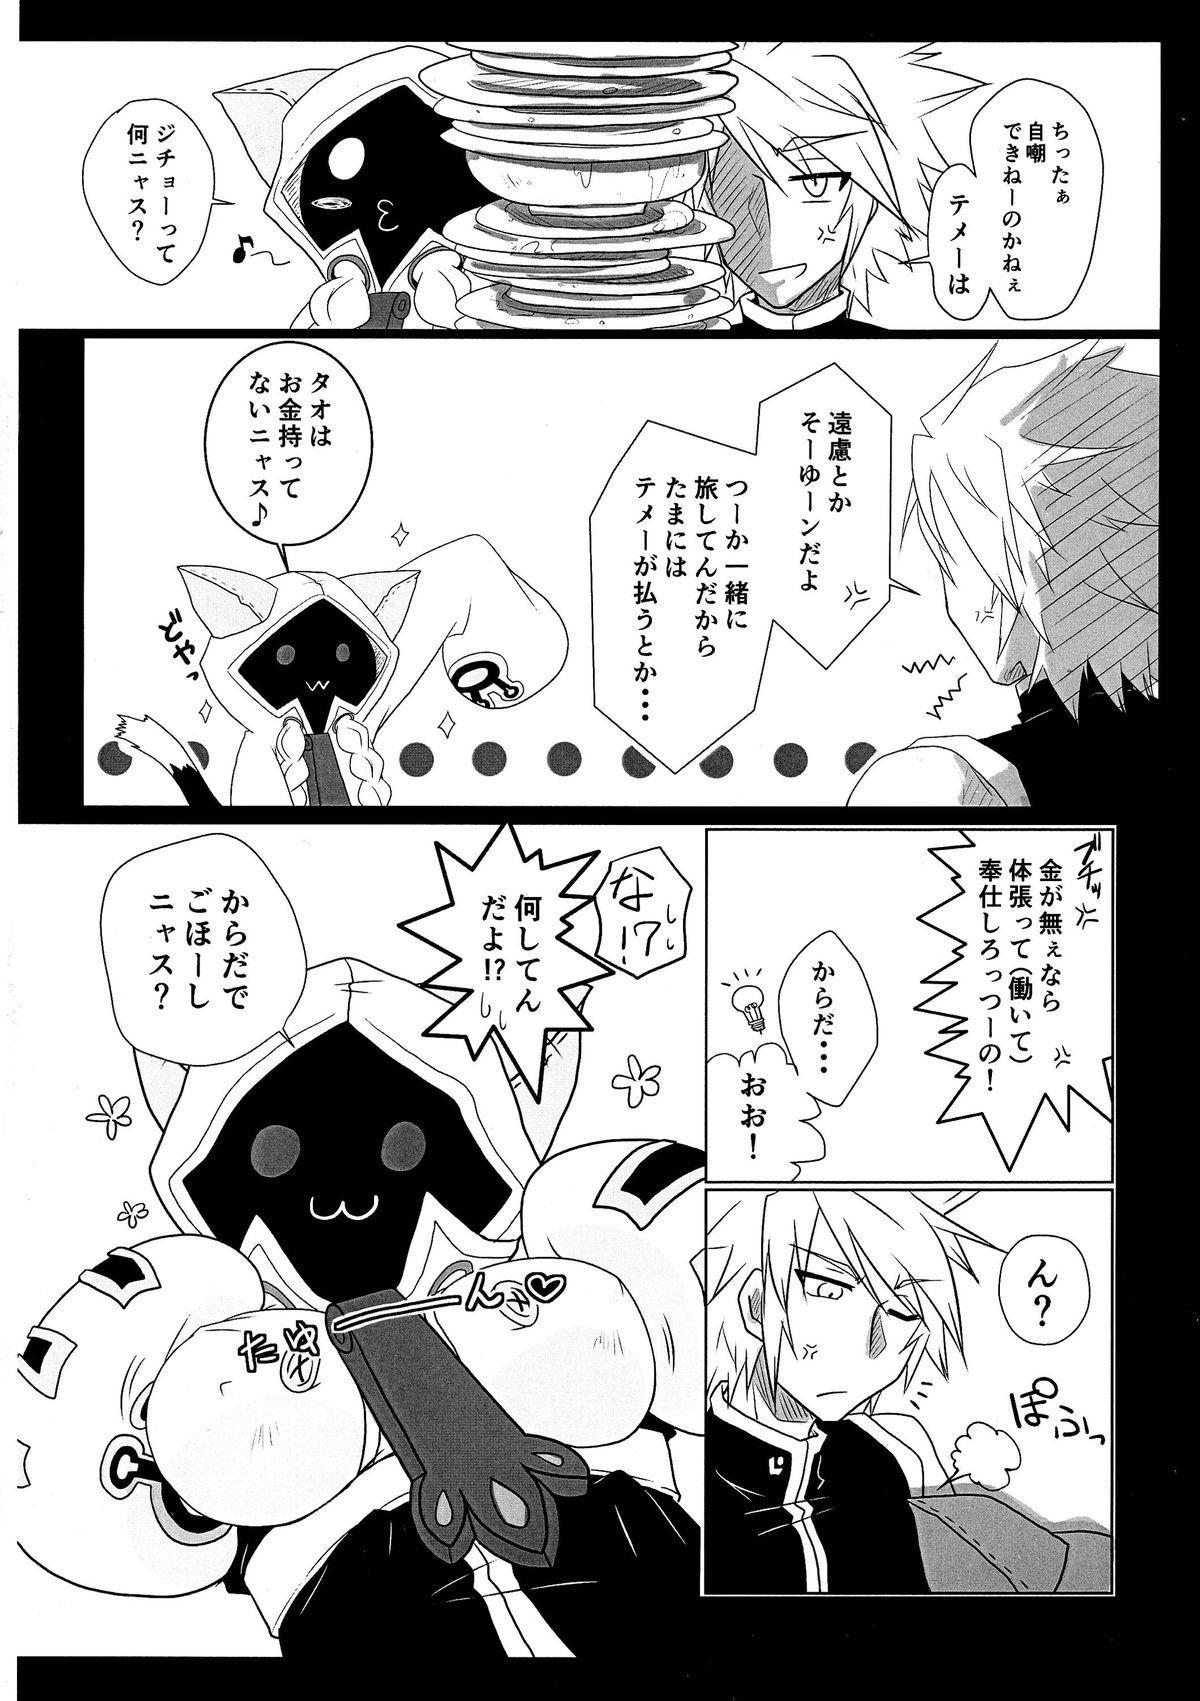 Tao no Ongaeshi 5